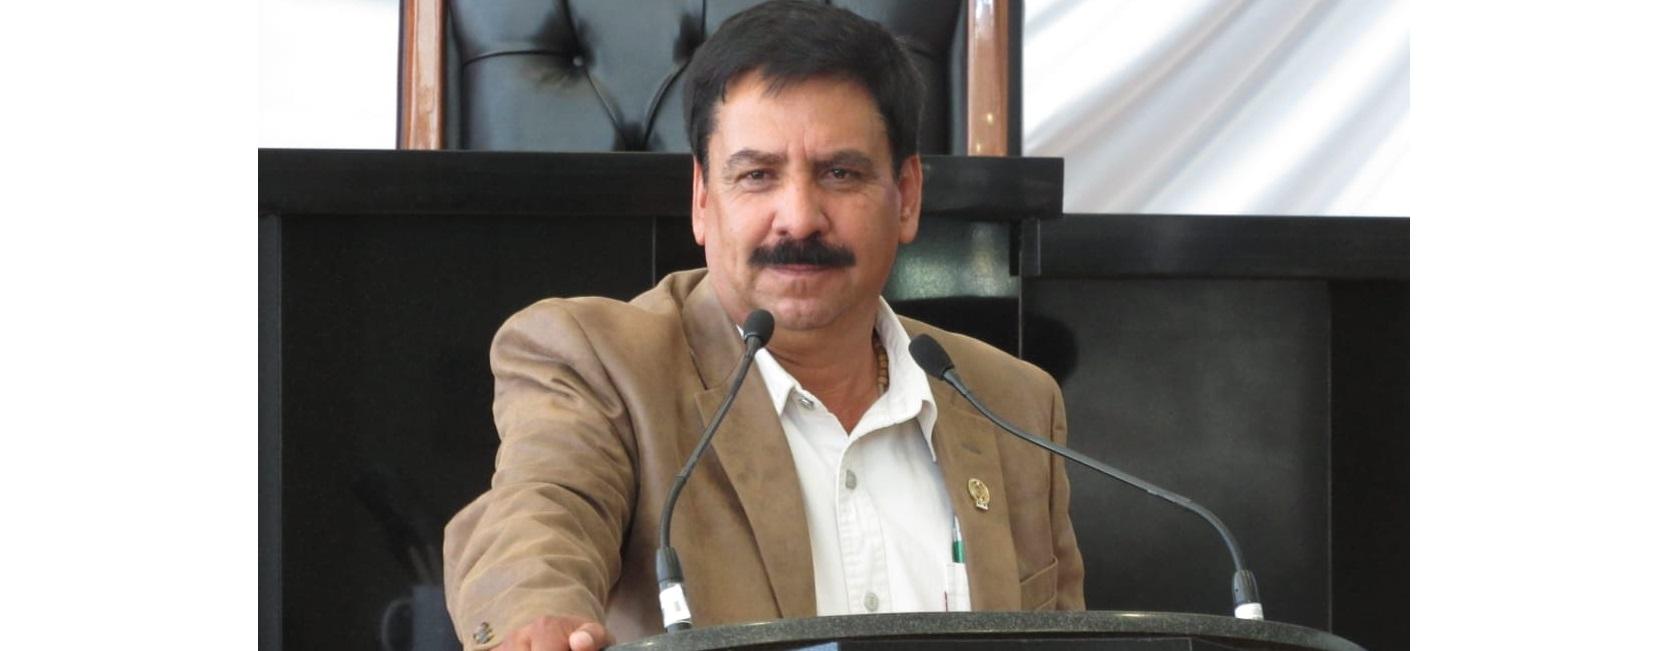 Aprueban Diputados exhorto a la Secretaria de Educación para prohibir uso de celulares en horas clase por iniciativa de Chuy Velázquez.